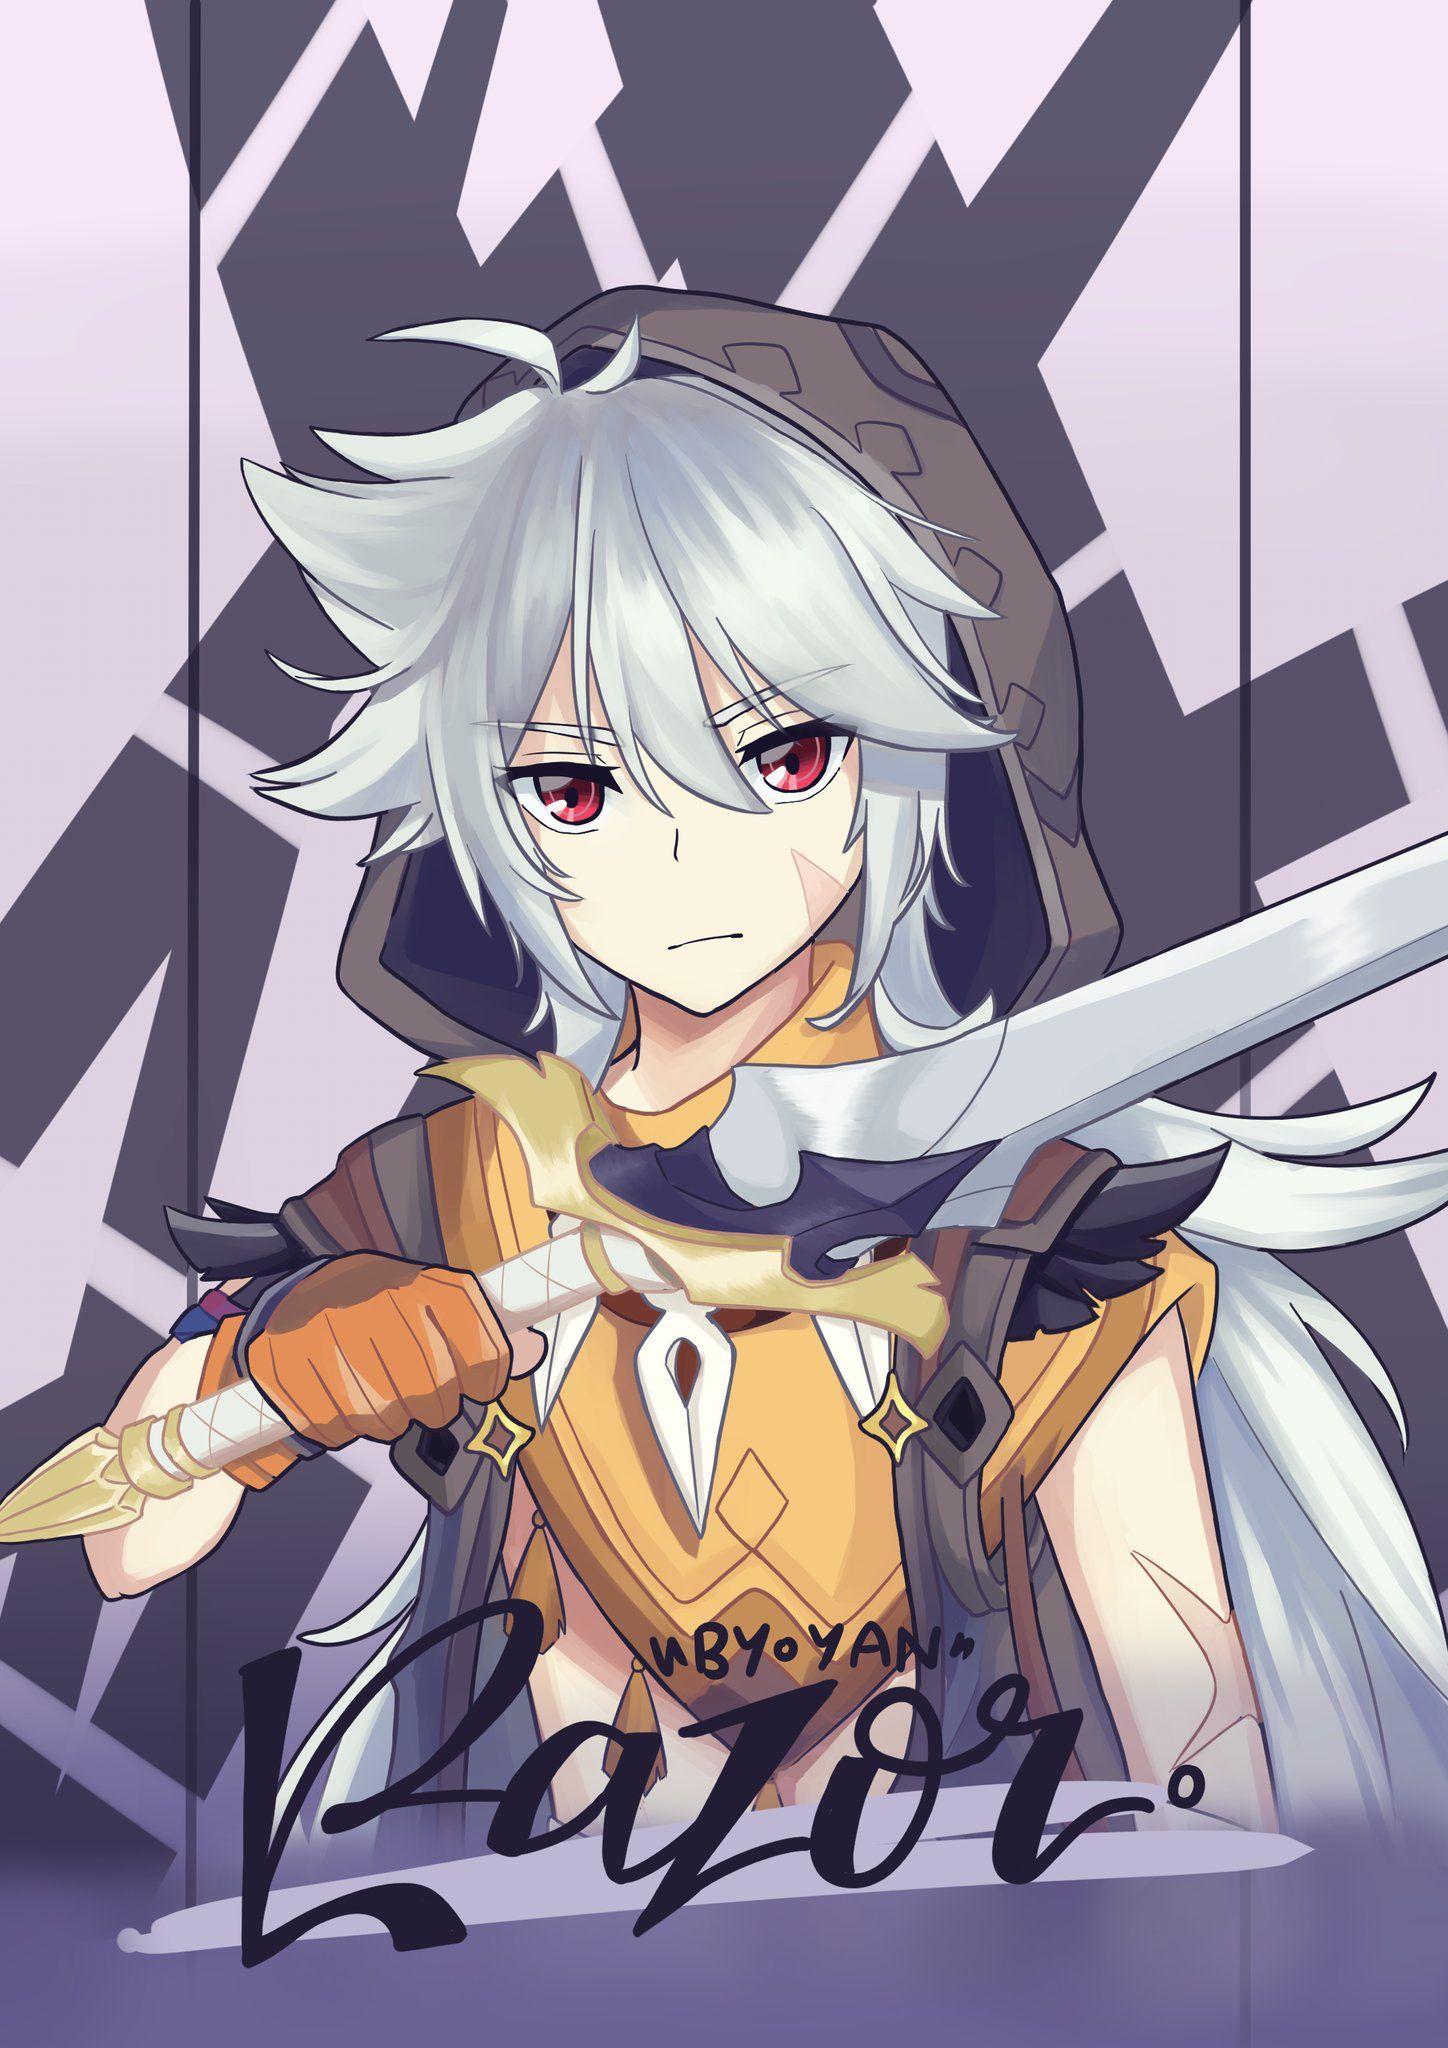 Pin By Mango On Razor Genshin Impact Anime Wolf Girl Anime Anime Maker